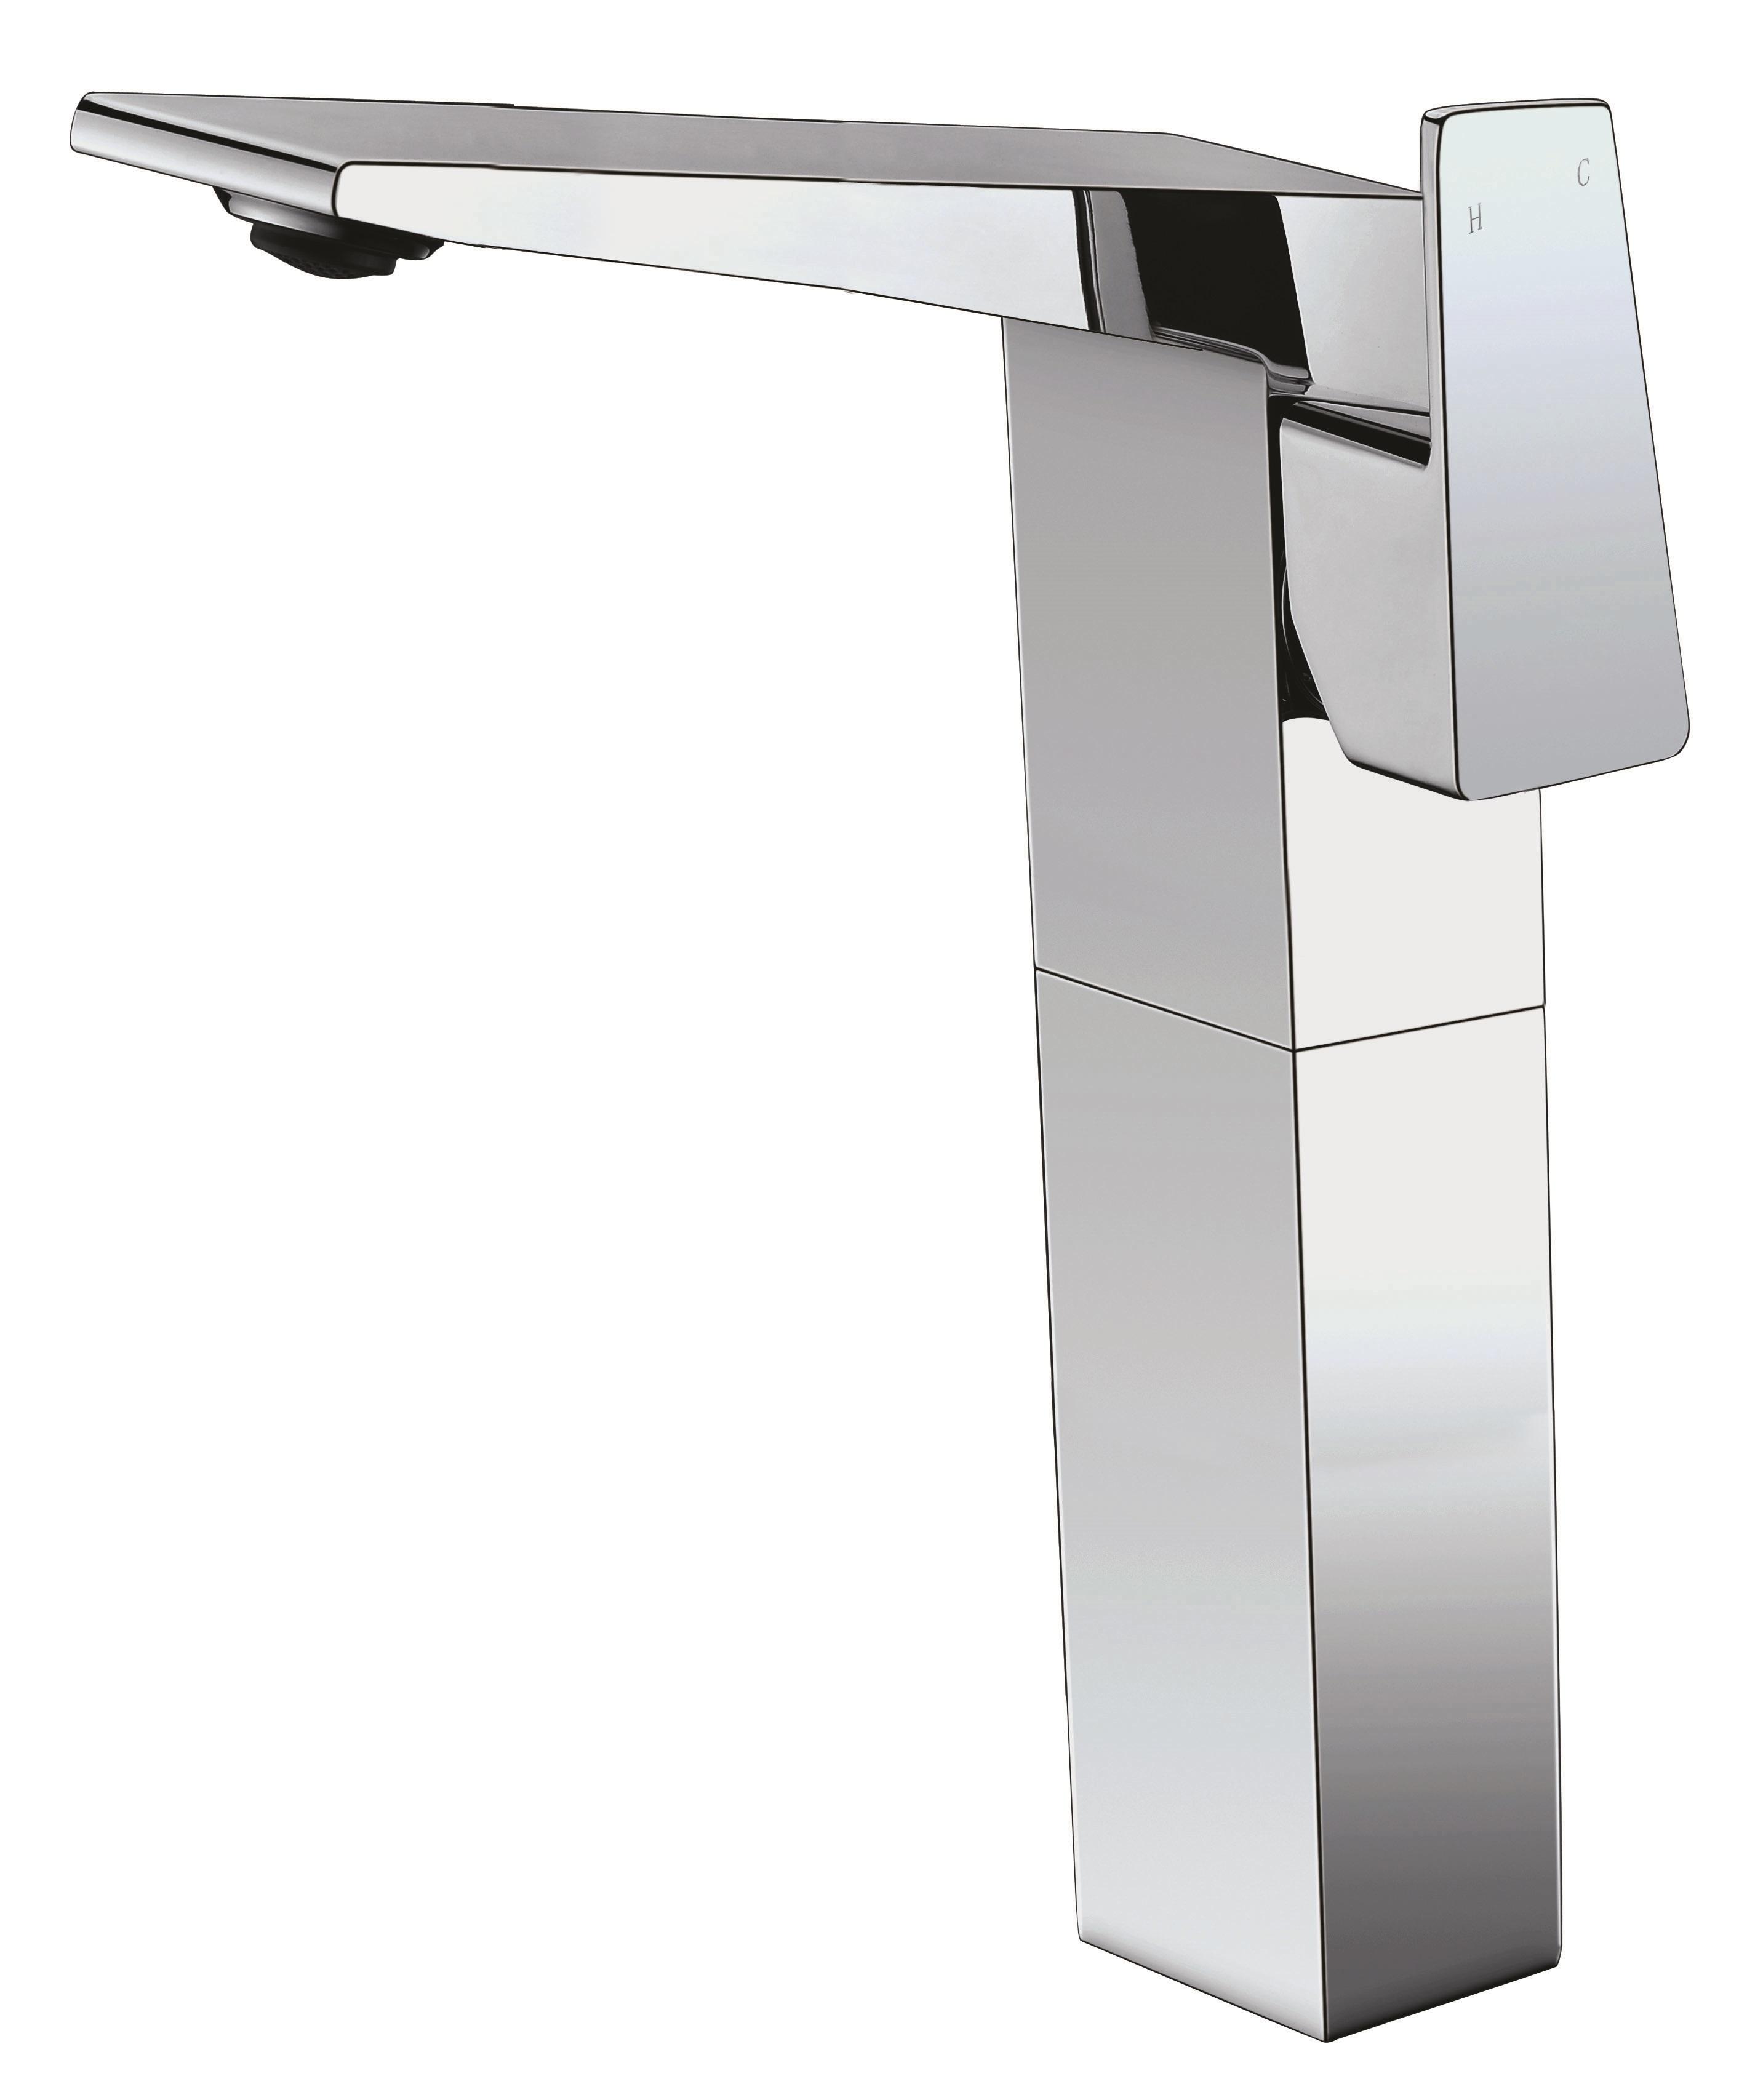 ALFI Brand AB1475-PC Polished Chrome Single Hole Tall Bathroom Faucet